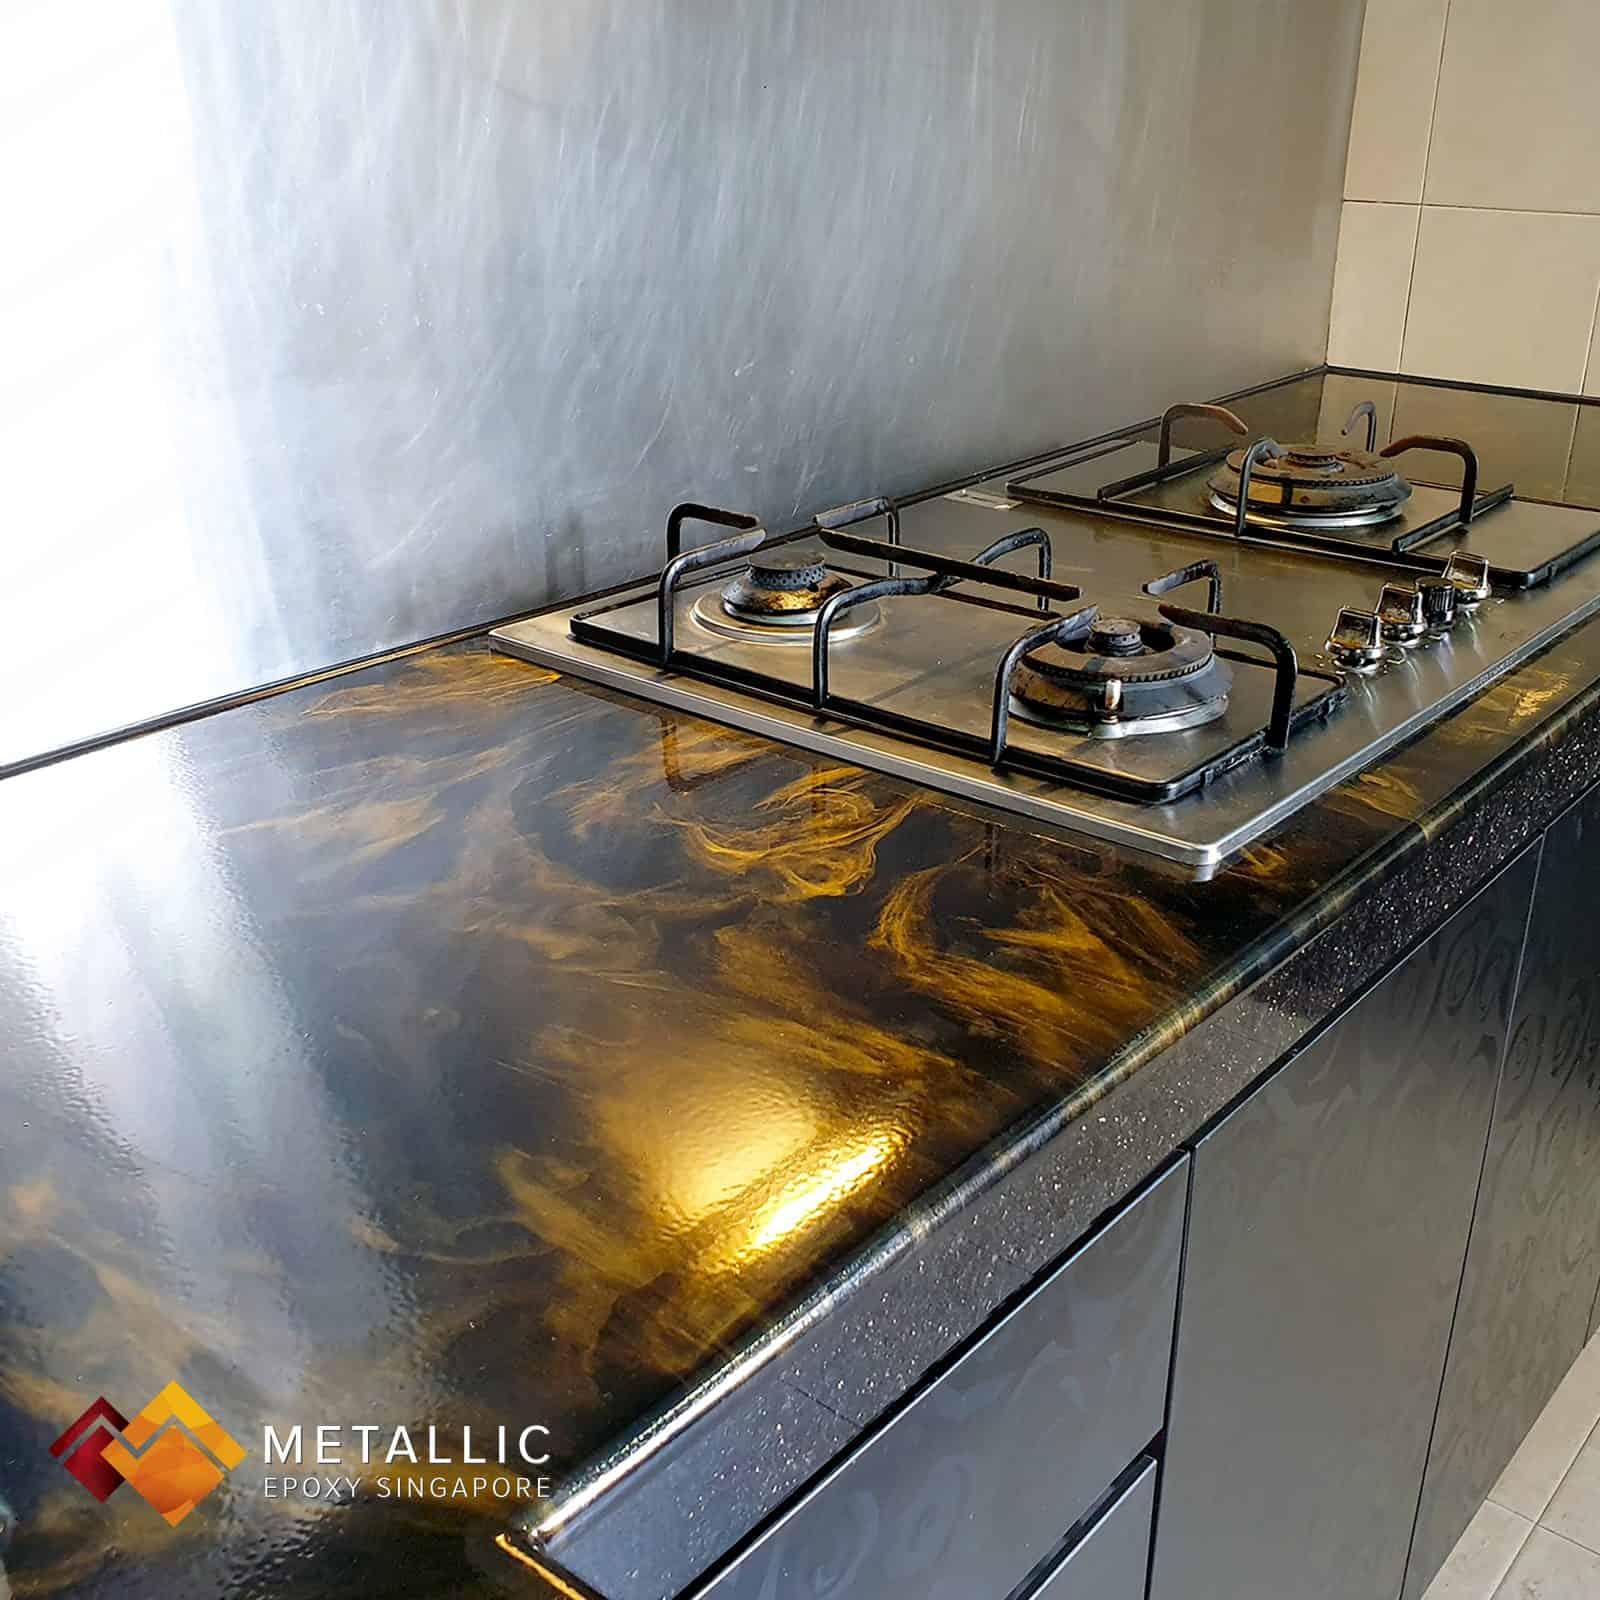 Black metallic epoxy singapore countertop